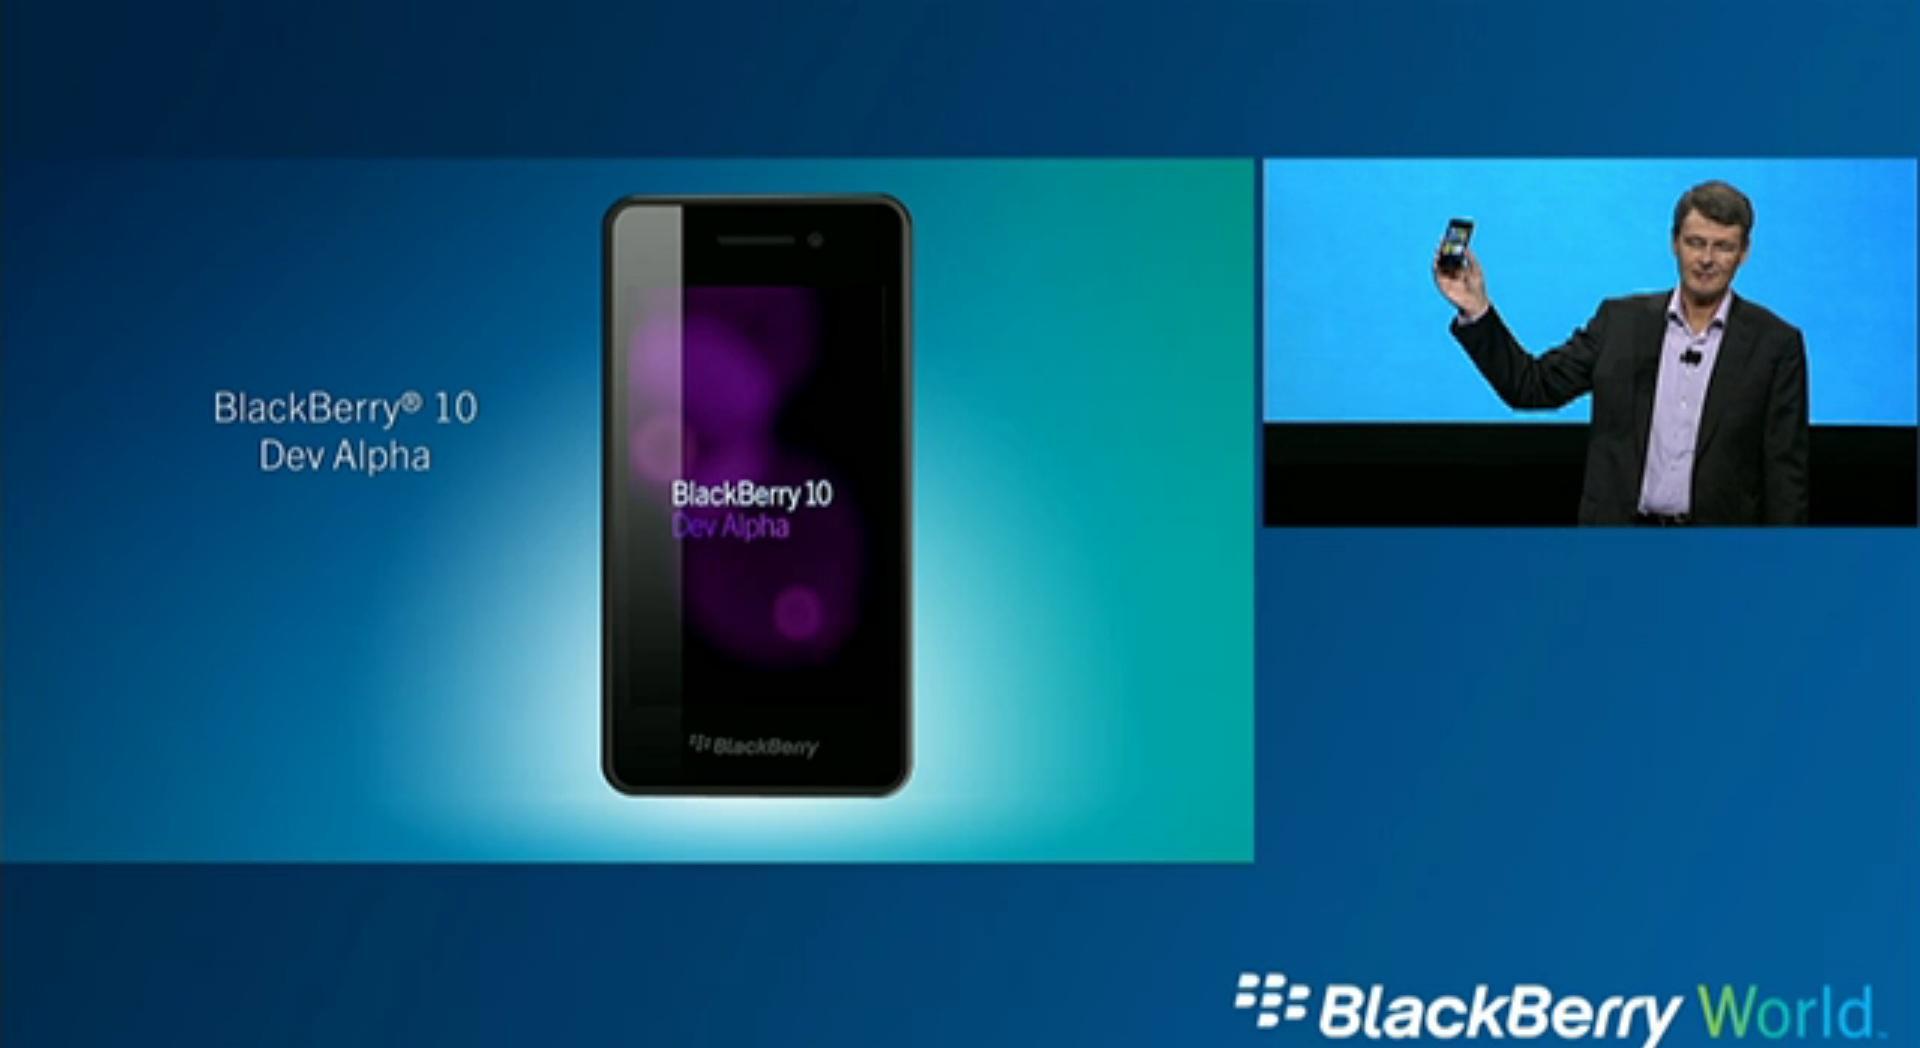 1340556601_blackberry-10-dev-alpha-device1.jpg